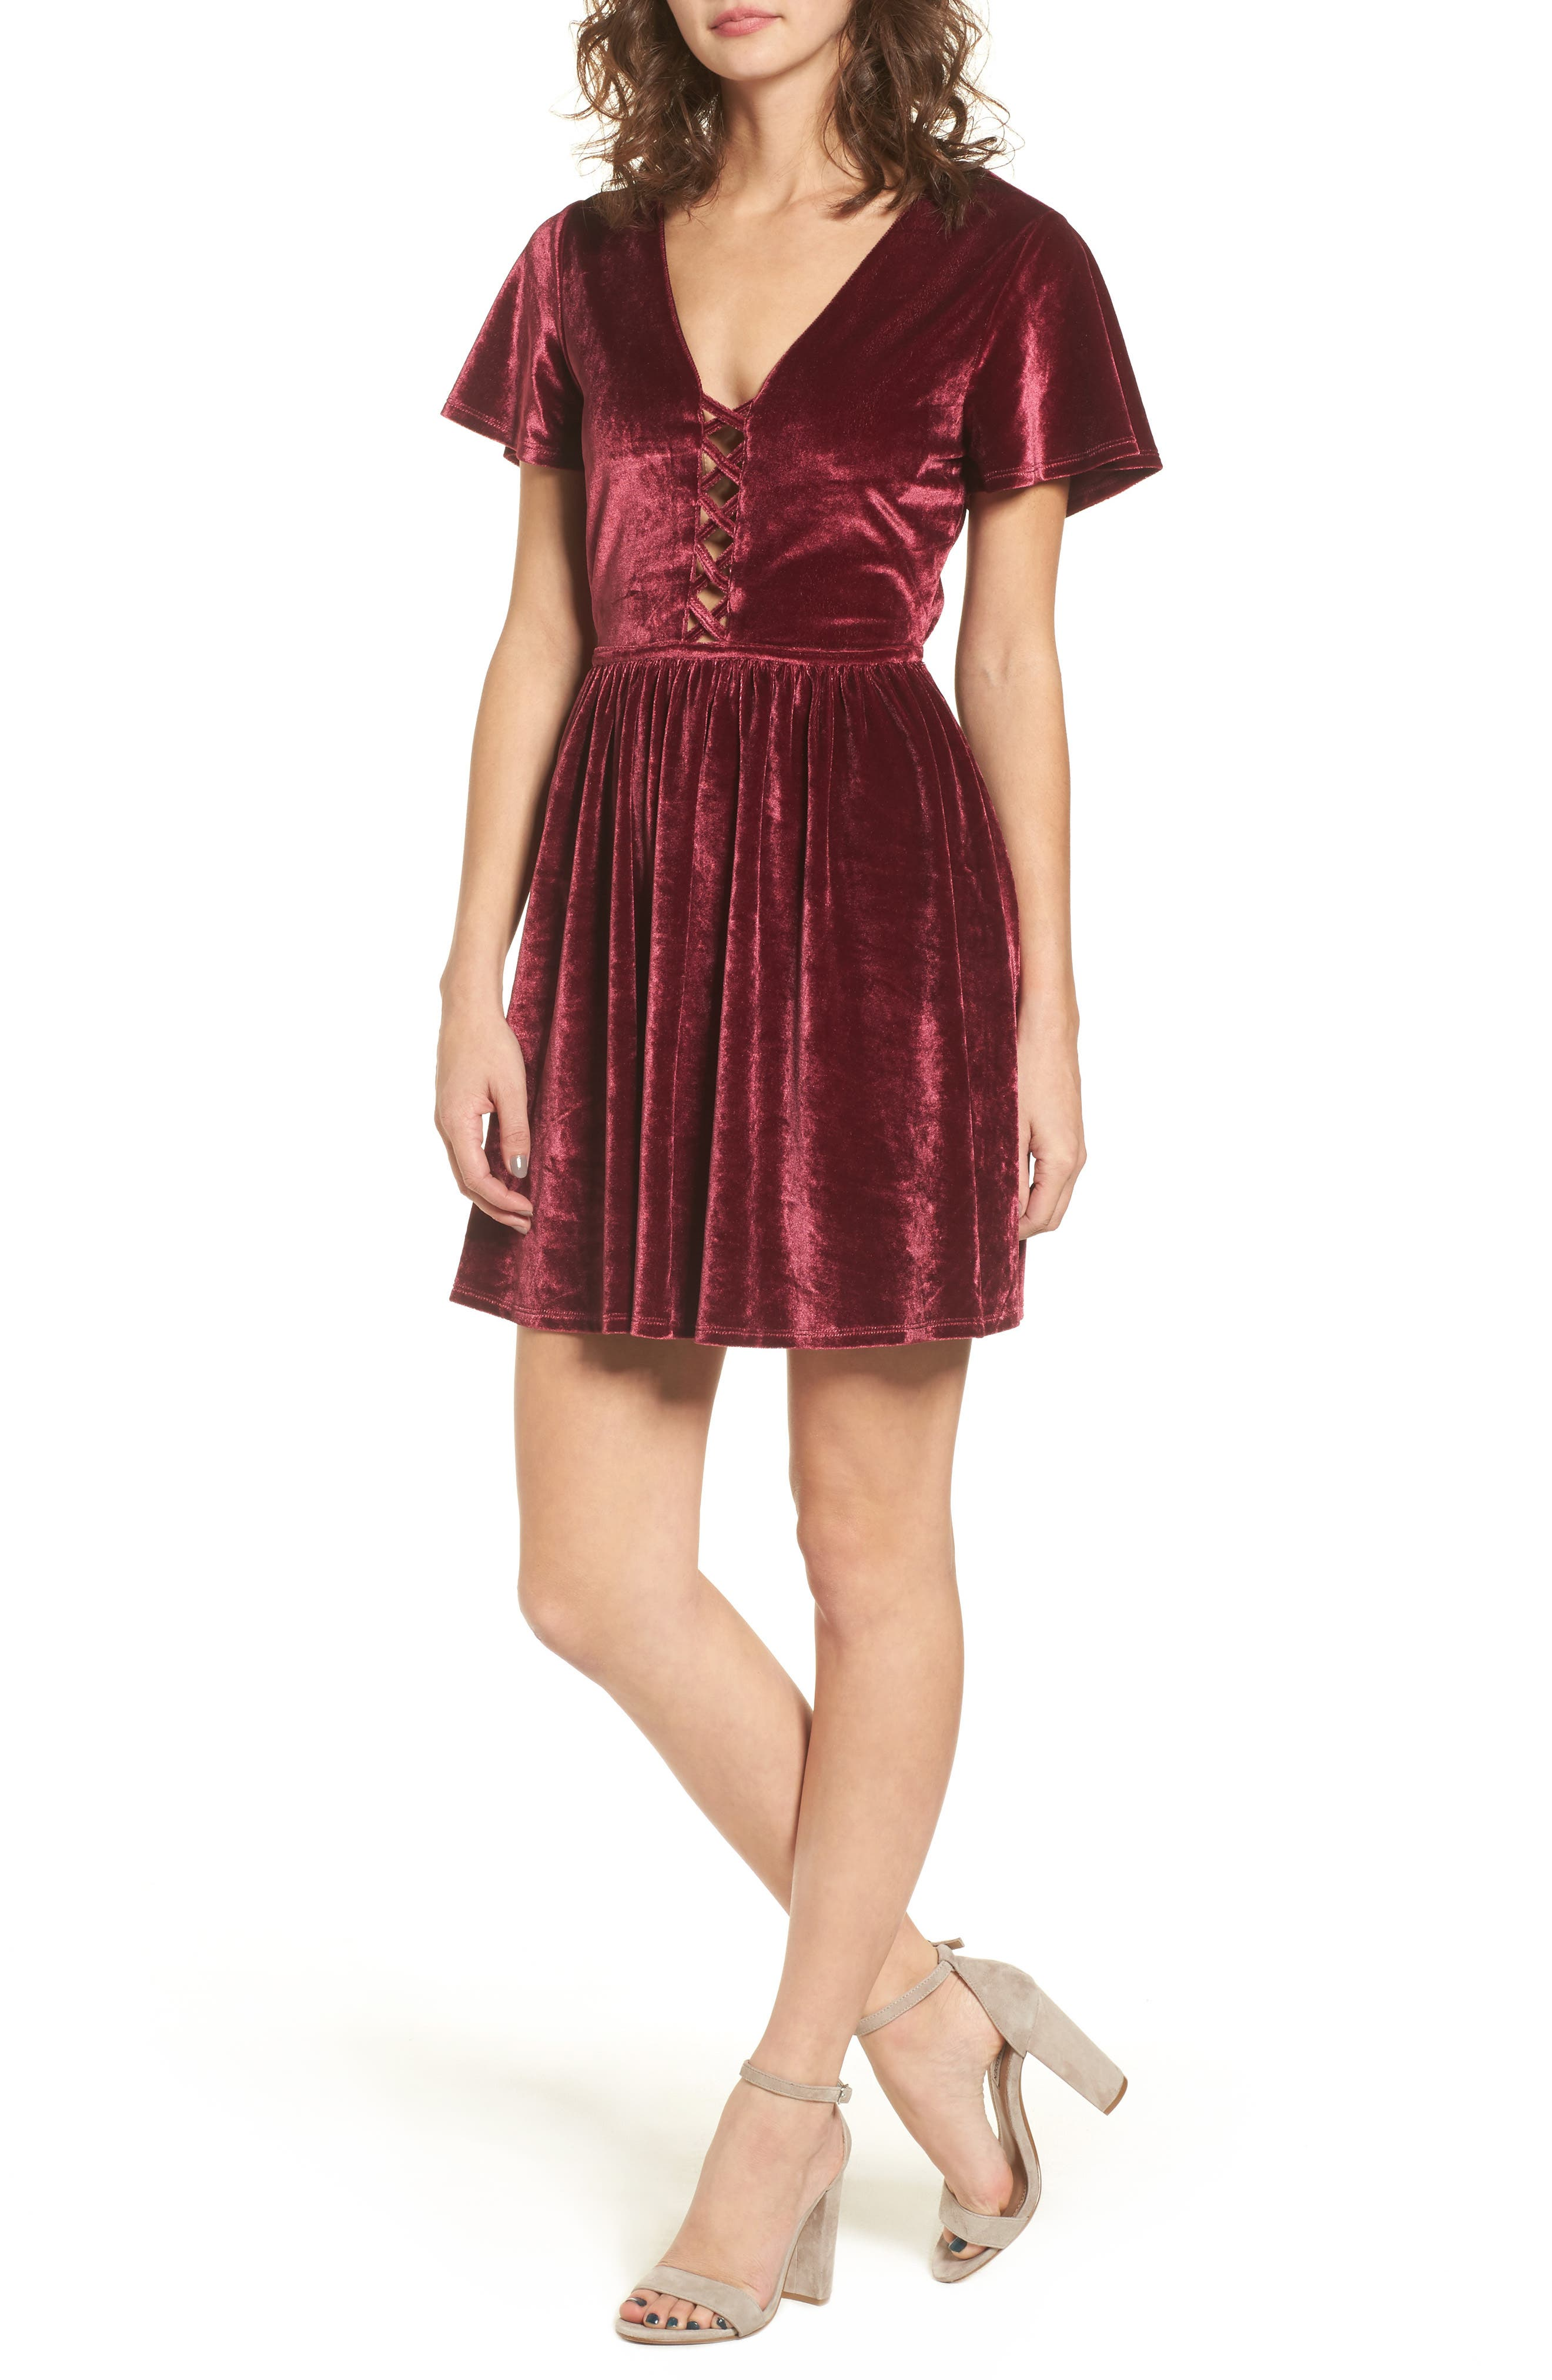 Velvacious Dress,                             Main thumbnail 1, color,                             930